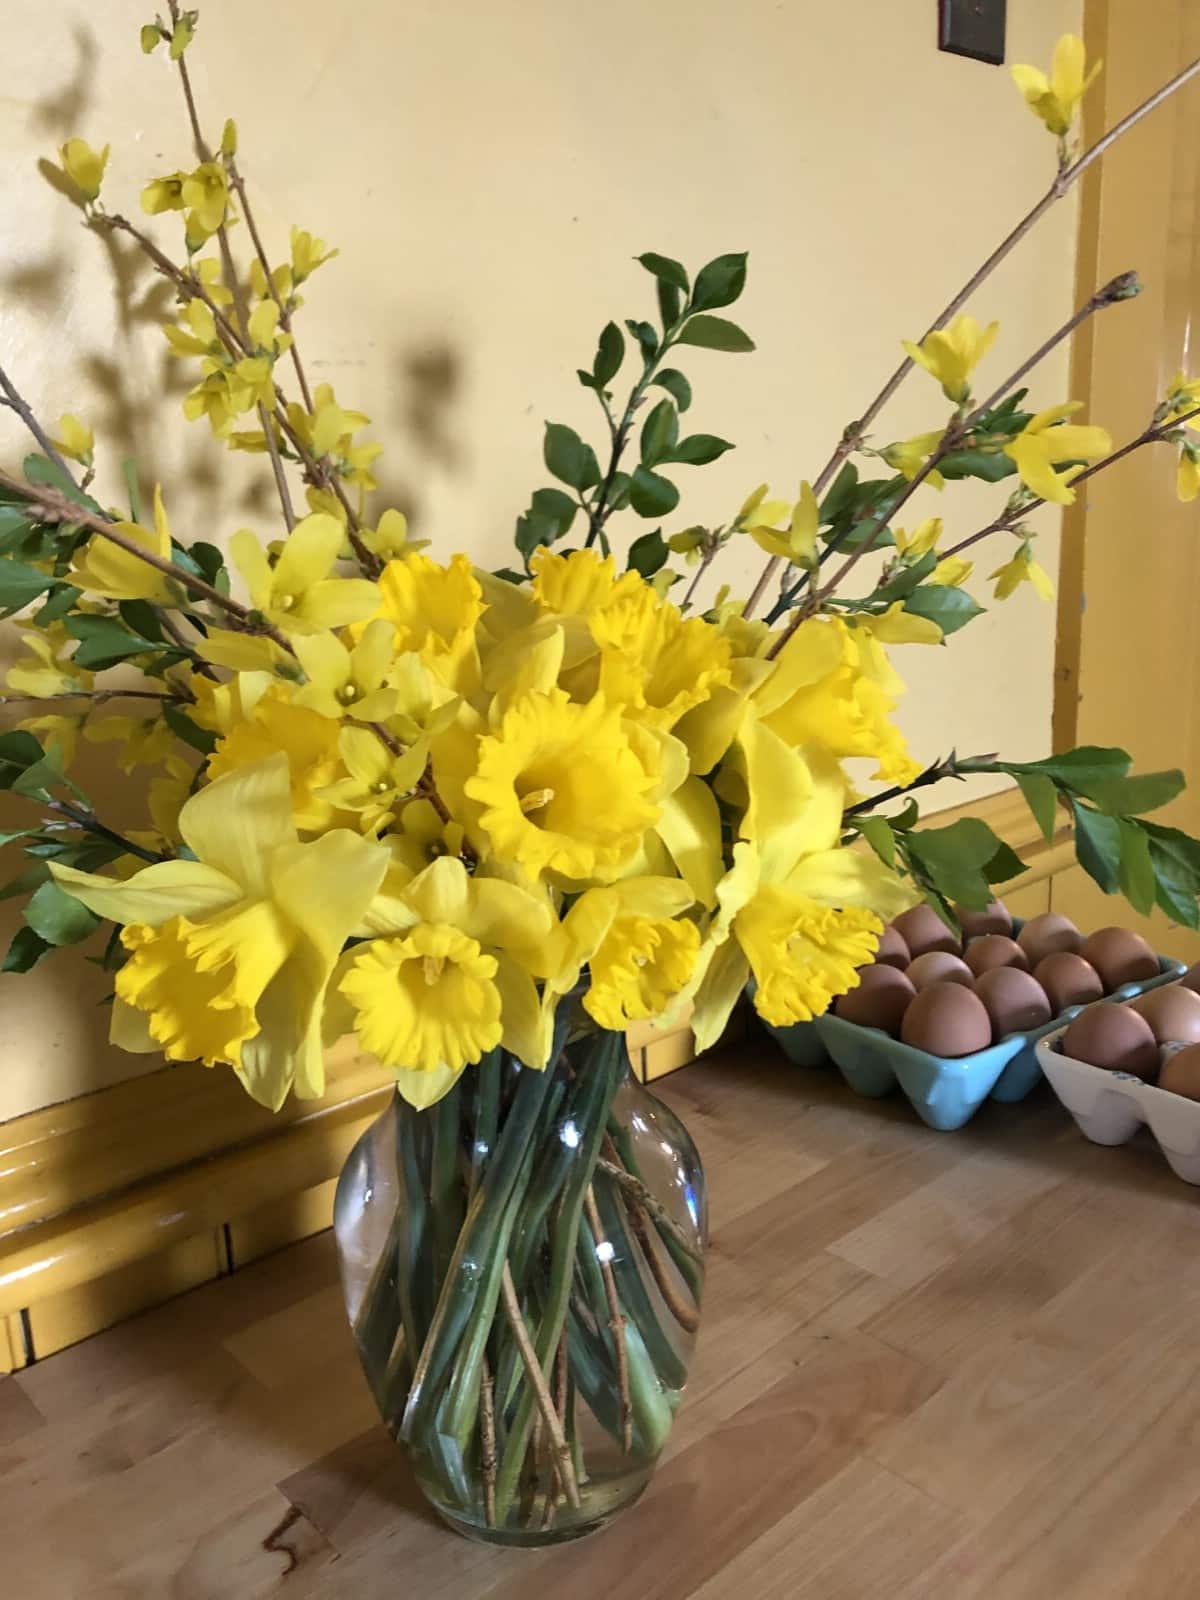 daffodil flower arrangement with filler greens